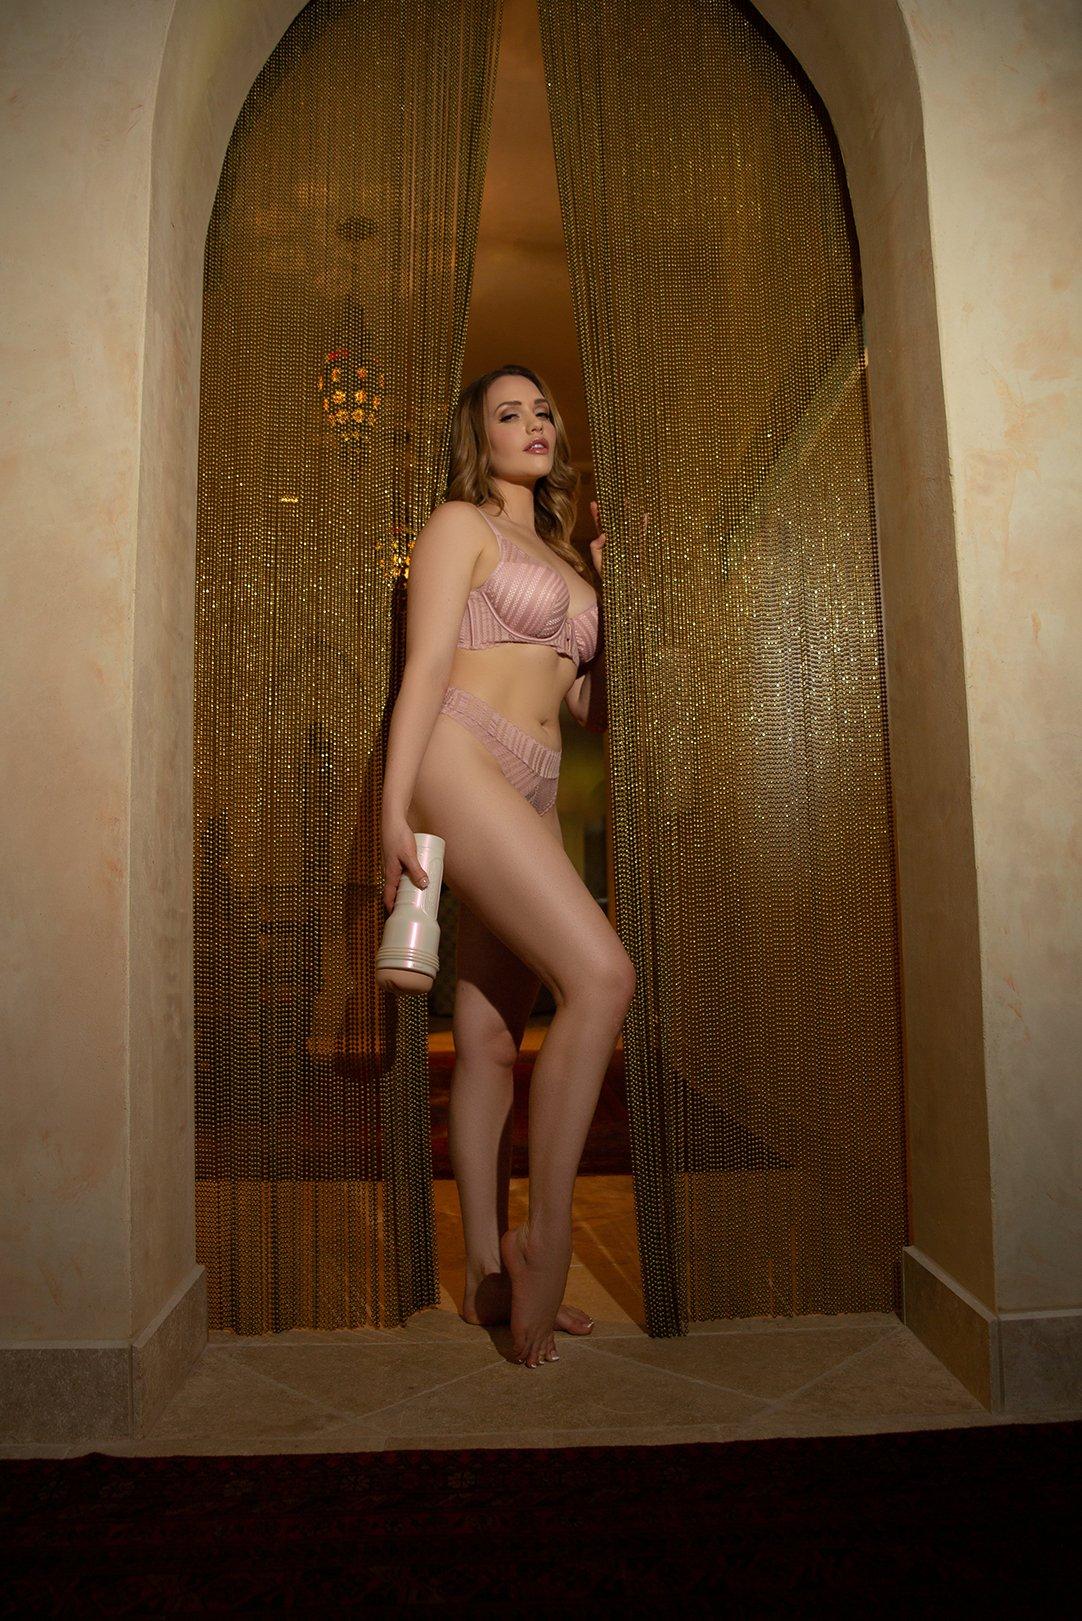 Mia Malkova Fleshlight Girl Image 1